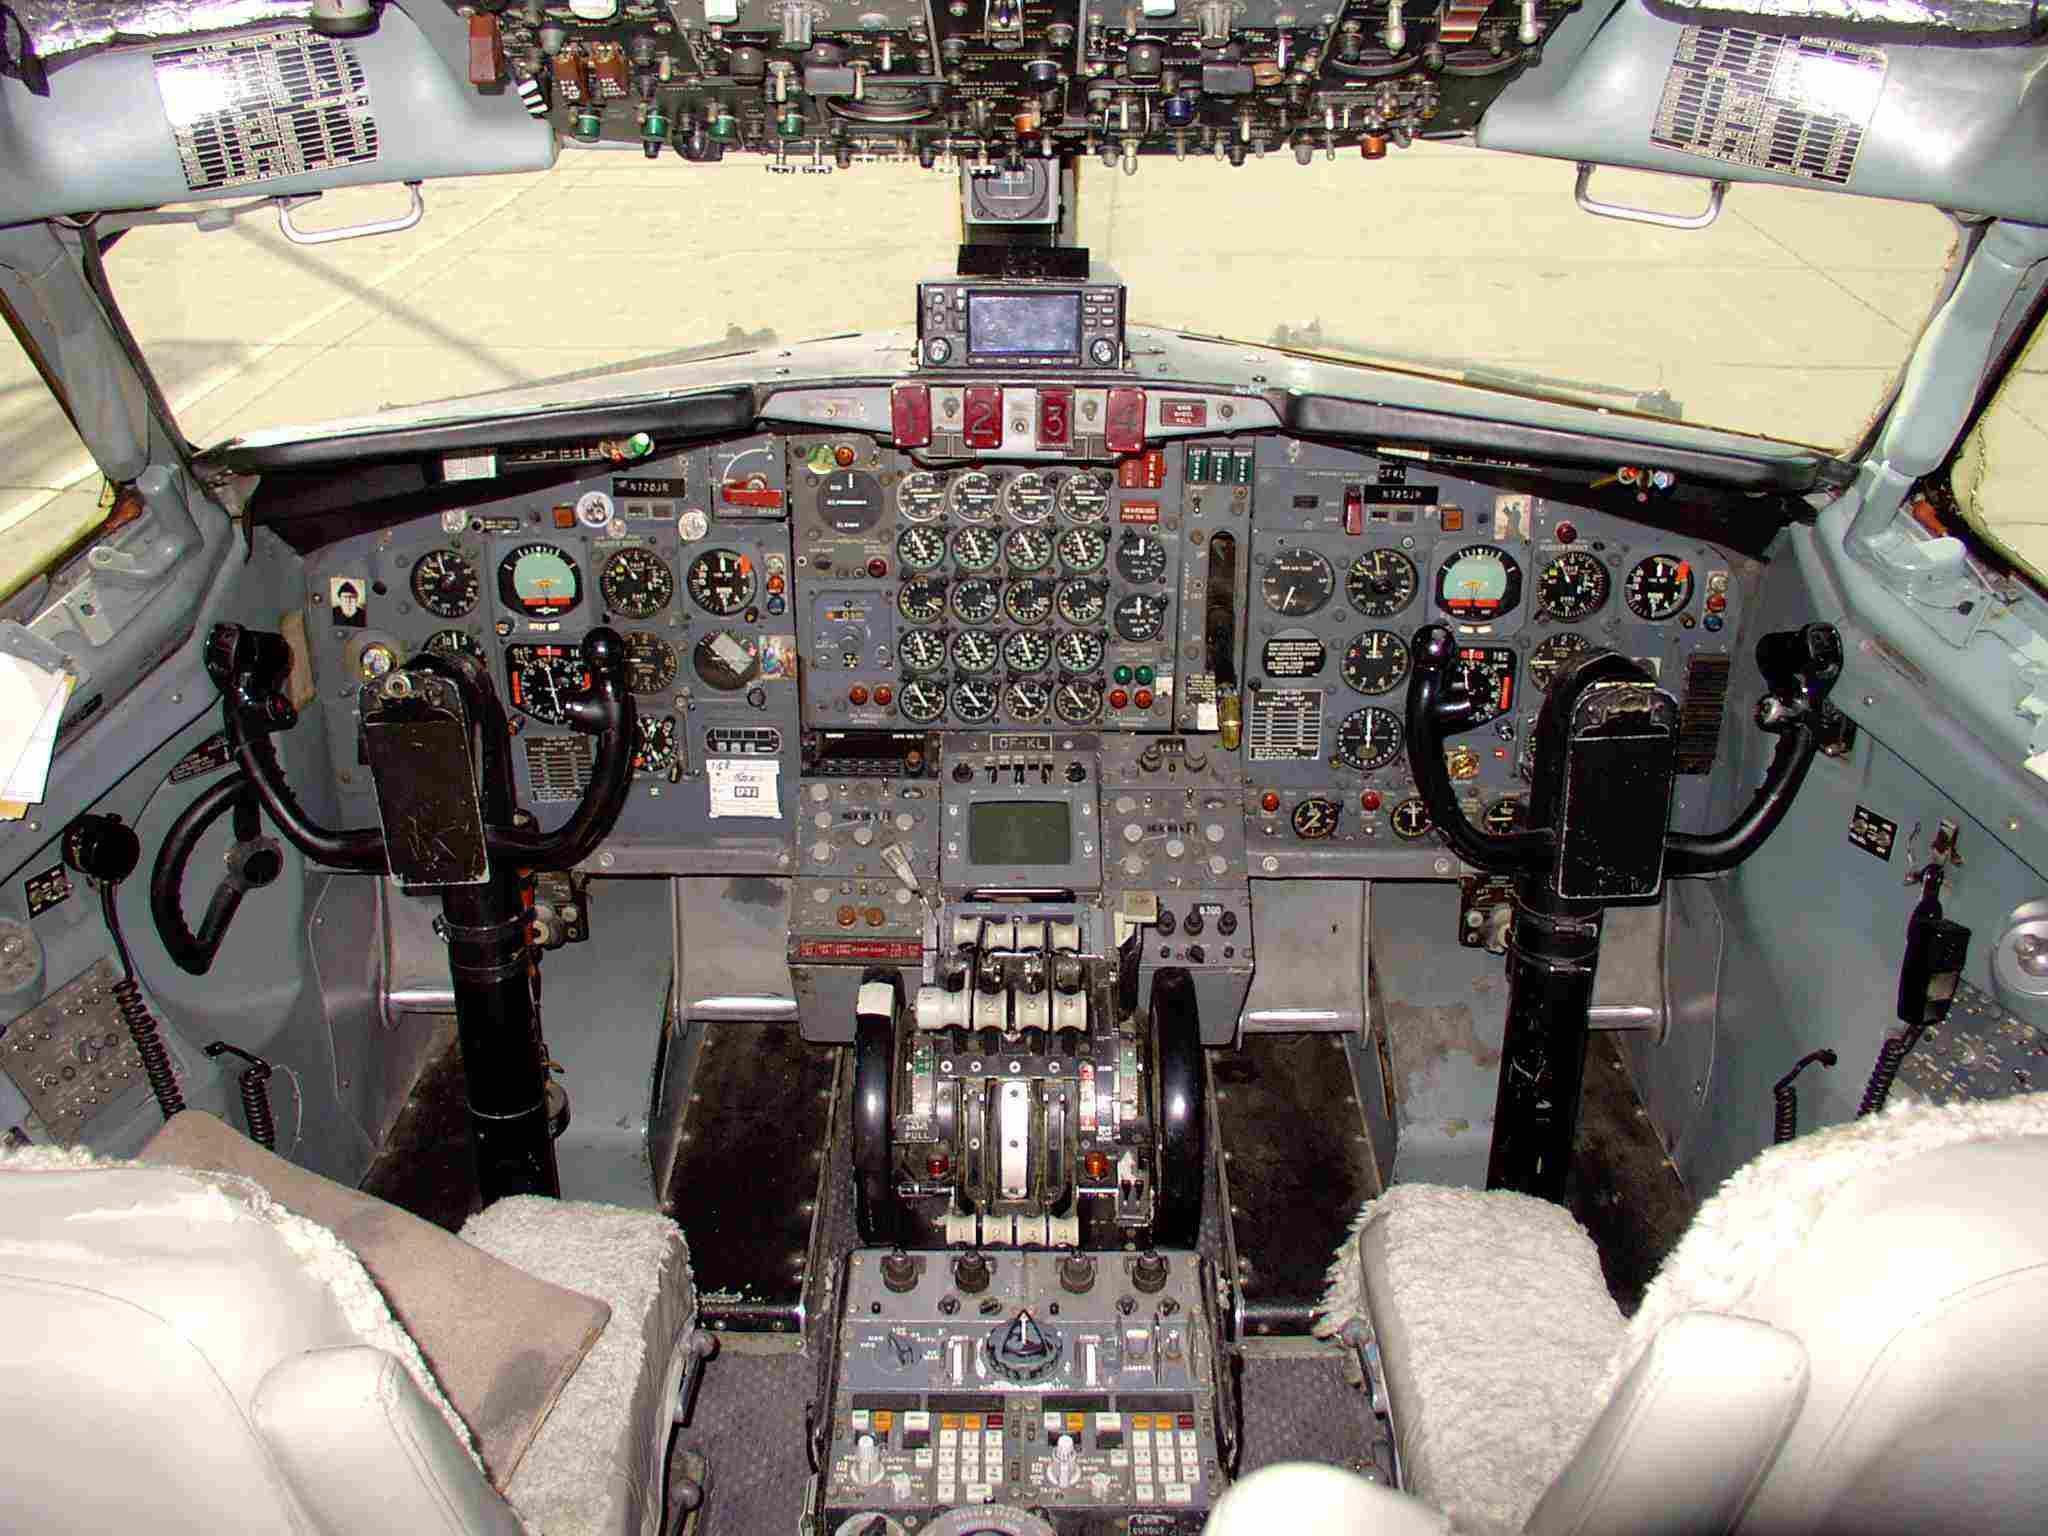 Commercial Pilot Wallpaper Hd Image Result For Boeing 707 Cockpit Aircraft Pinterest